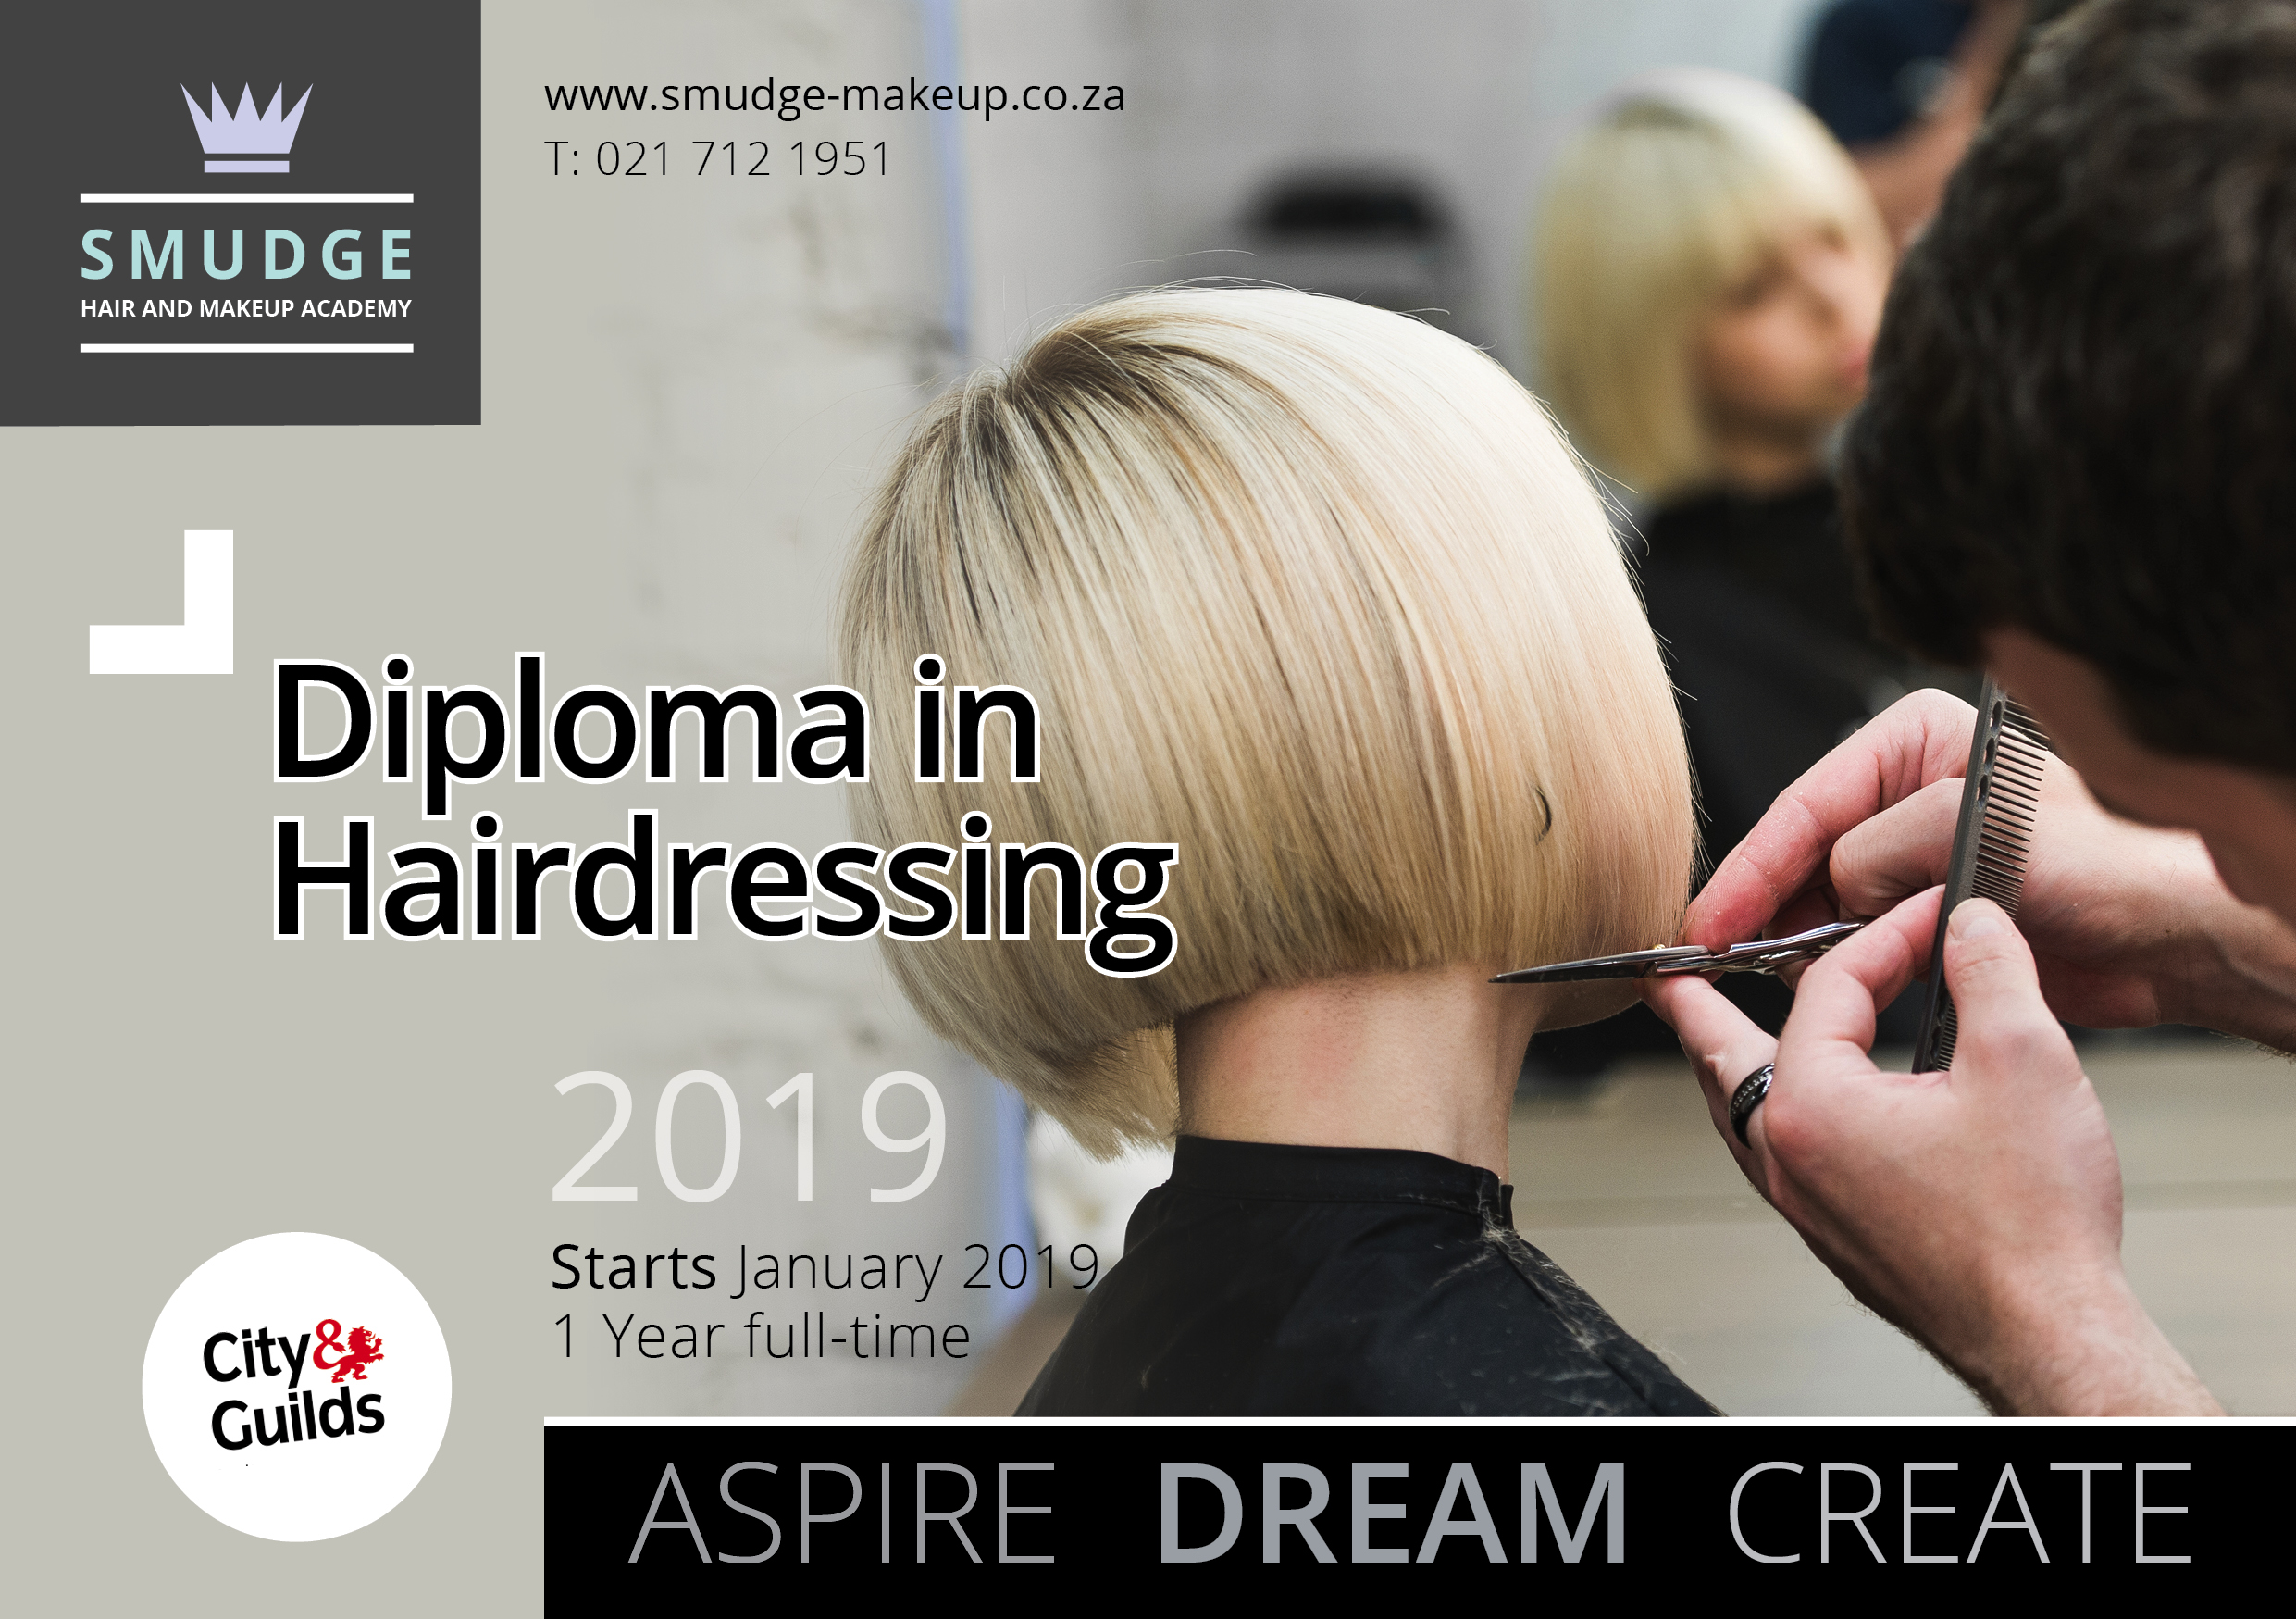 Smudge flyers - Hairdressing.jpg